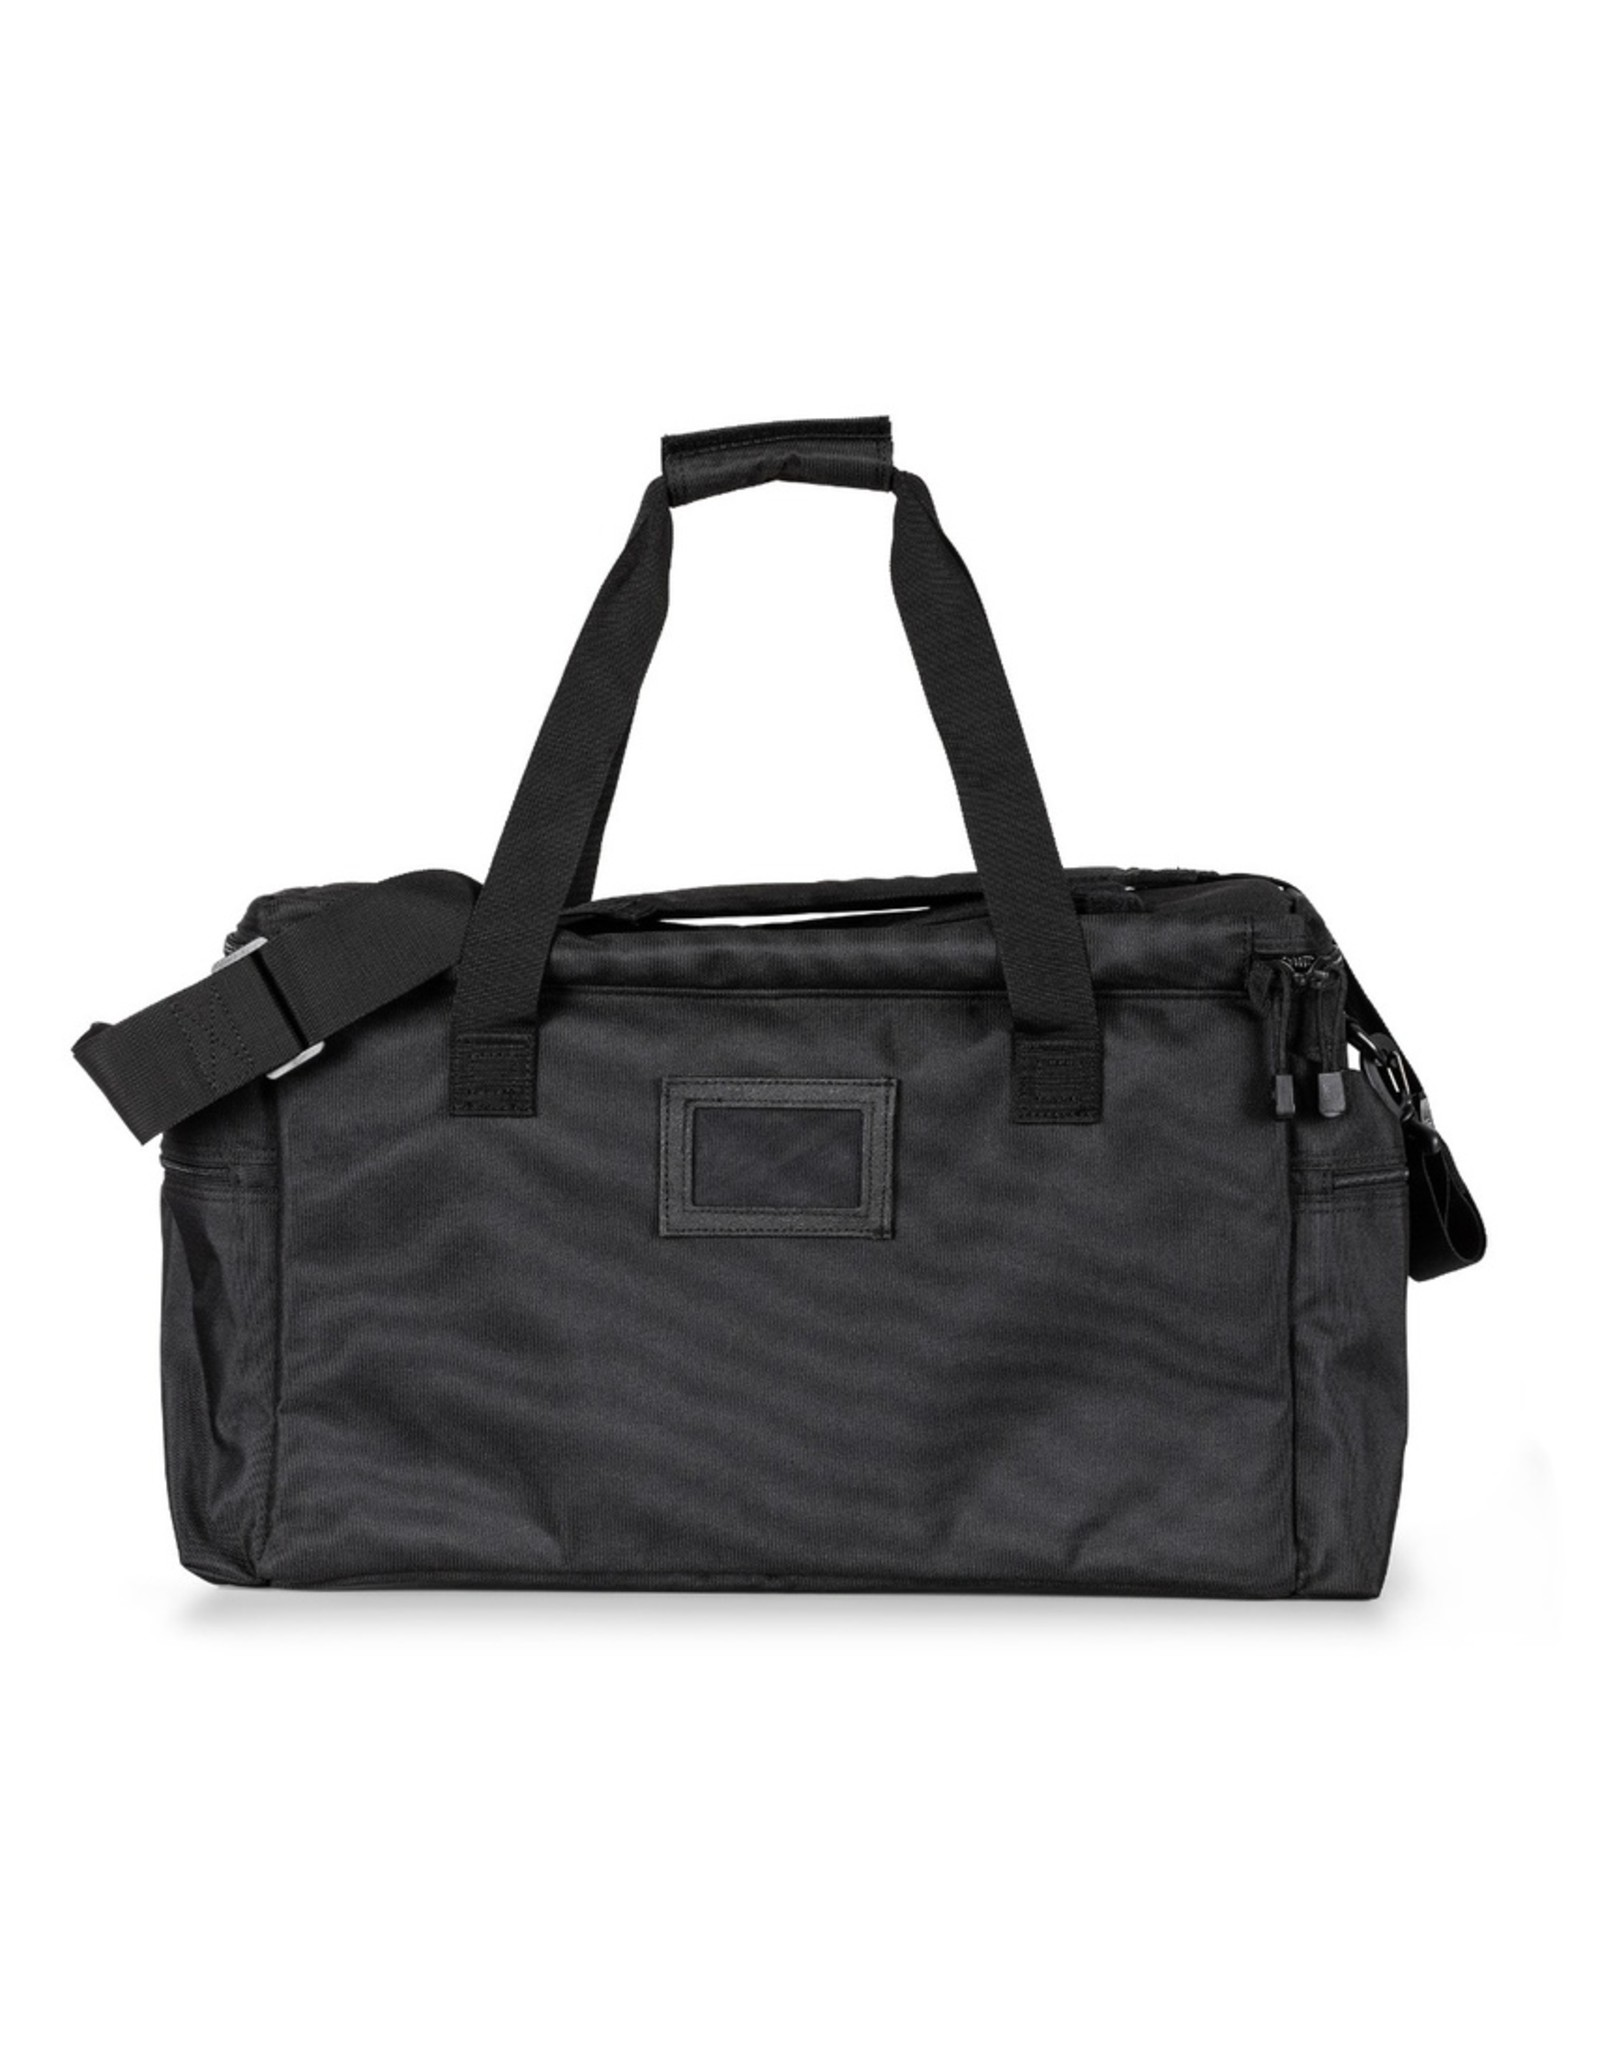 Patrol Ready Bag